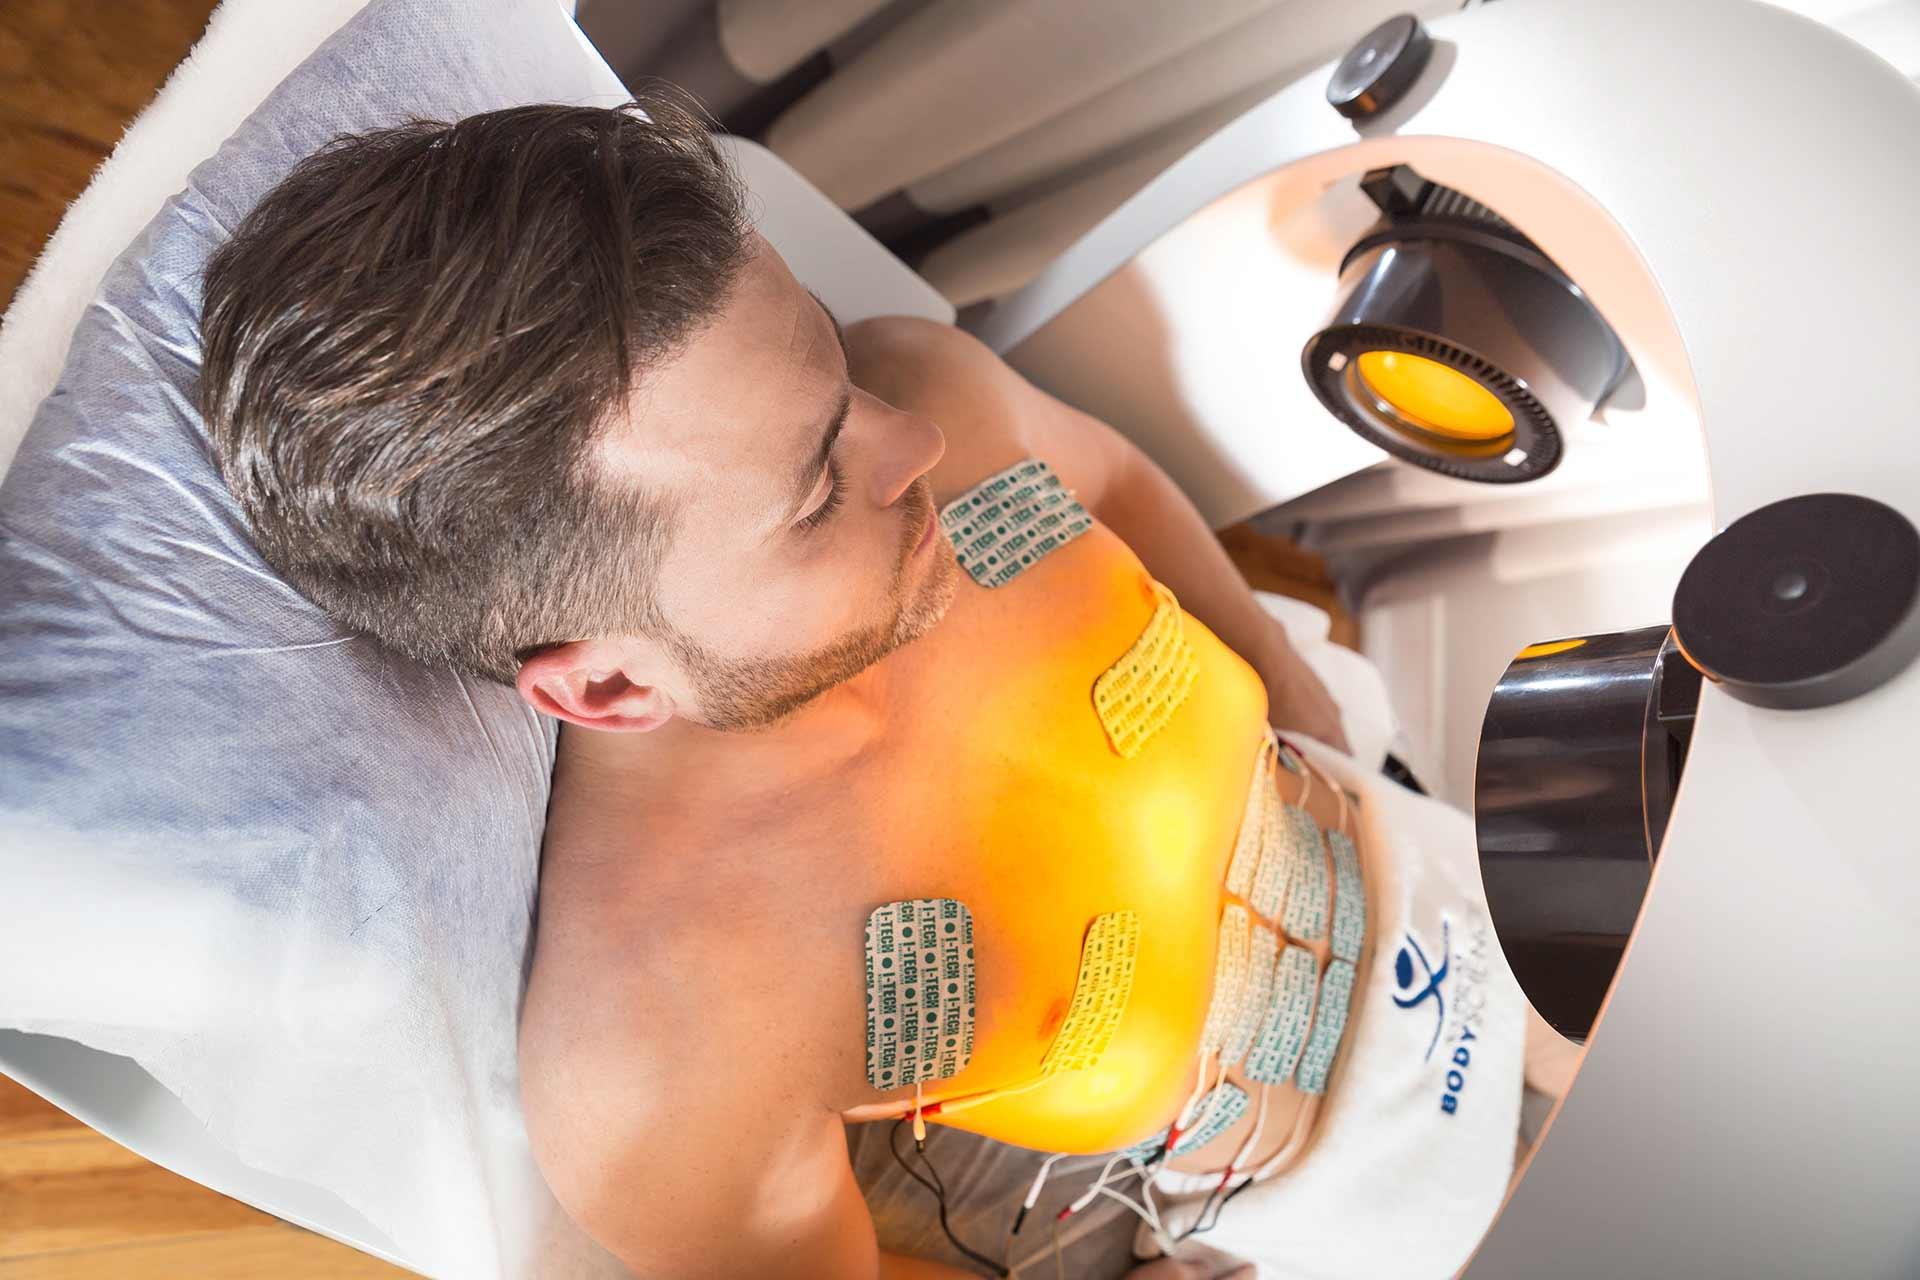 bodyscience-clinica-estetica-tratamentos-corpo-shaperabb-4